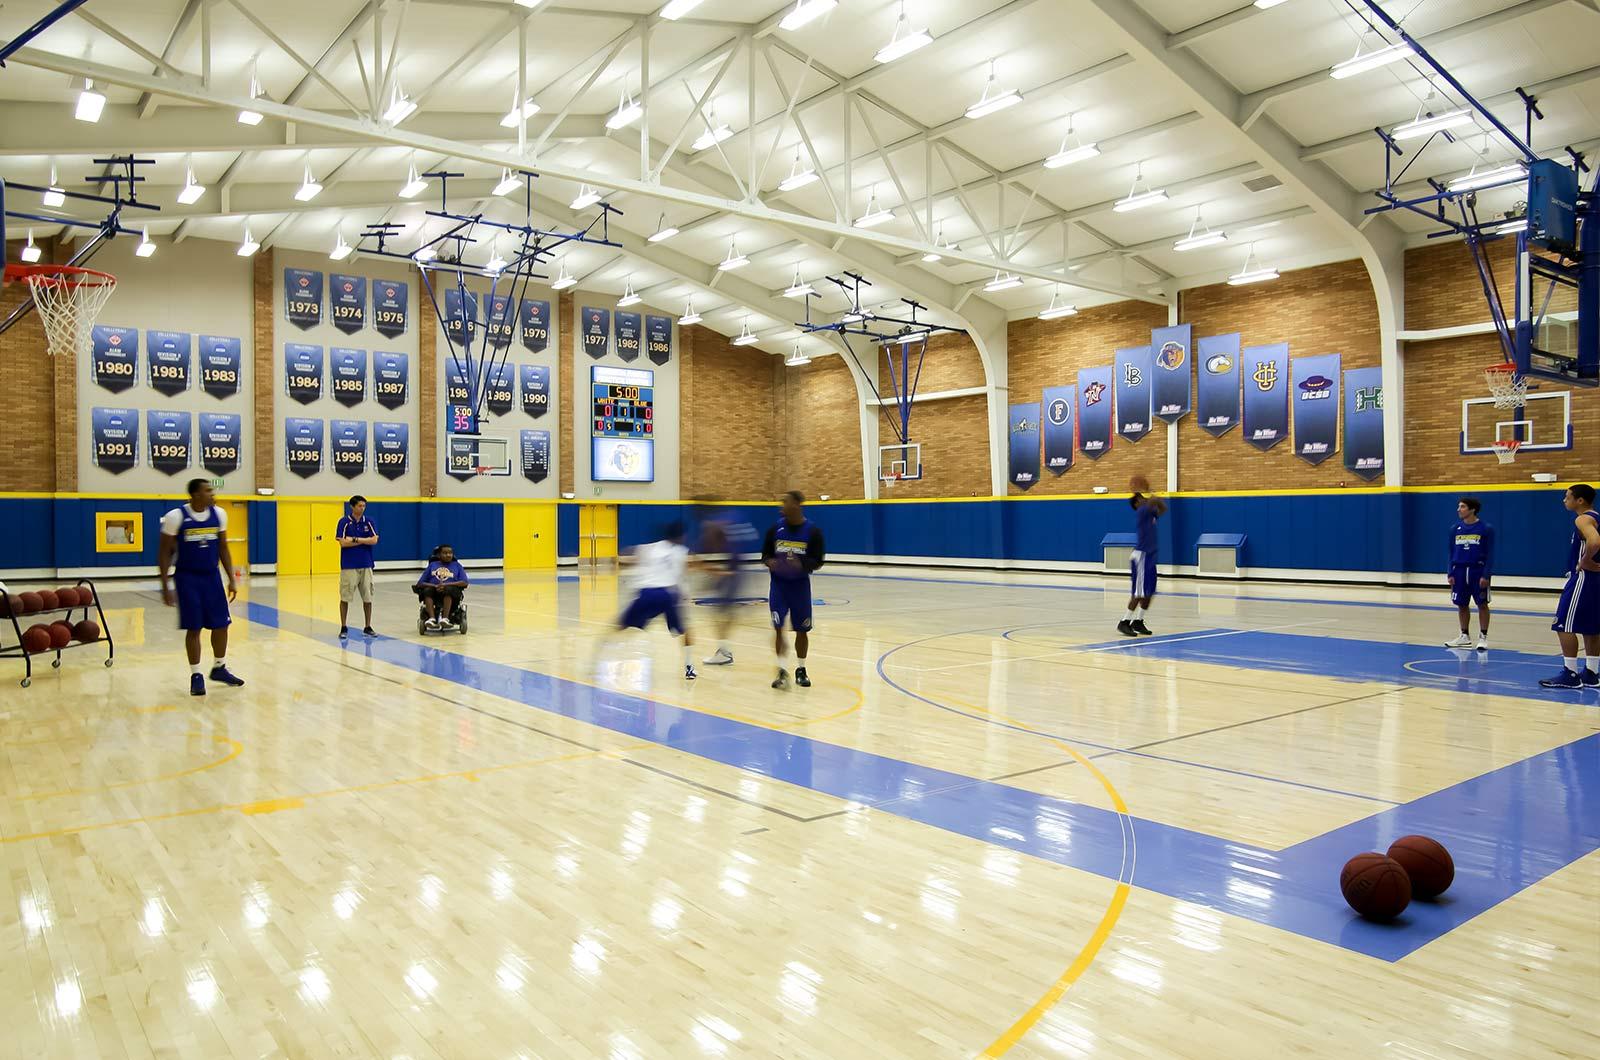 Basketbal-Team-at-Practice-UCR-360-Tours-Virtual-Tour-Company-College-Vitual-Tours-Virtual-Tours-For-College